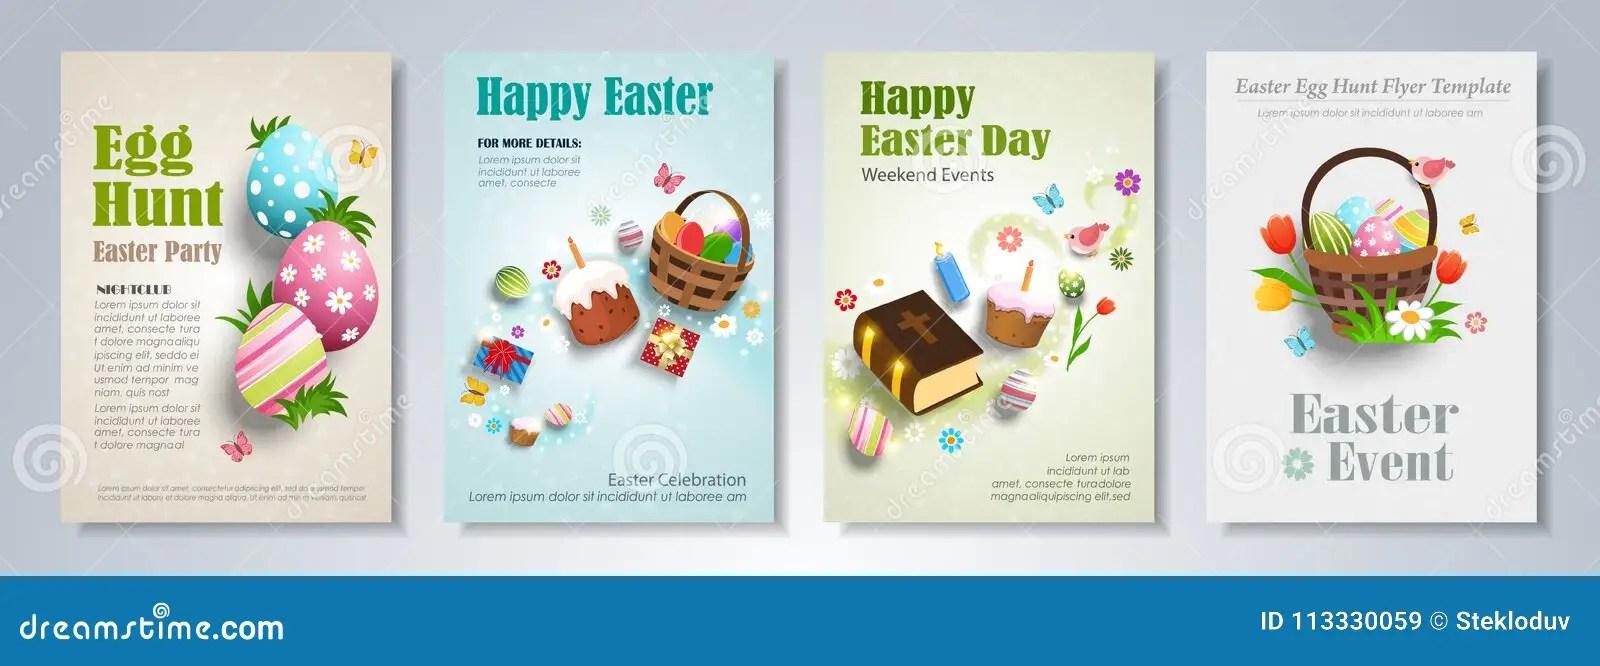 Easter brochure template stock vector Illustration of grass - 113330059